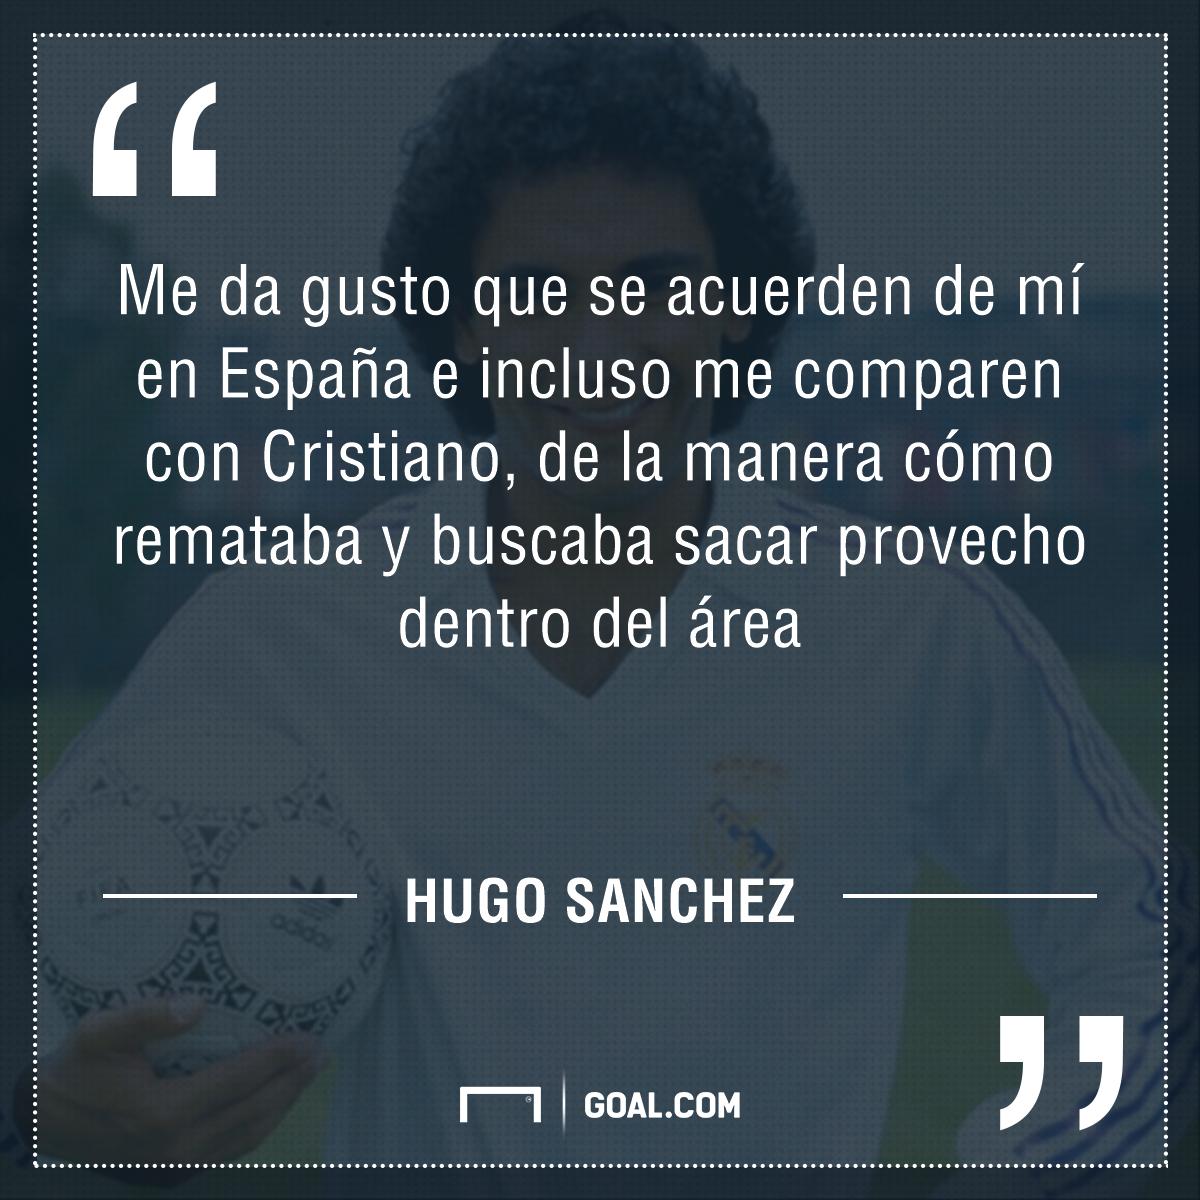 ps hugo sanchez